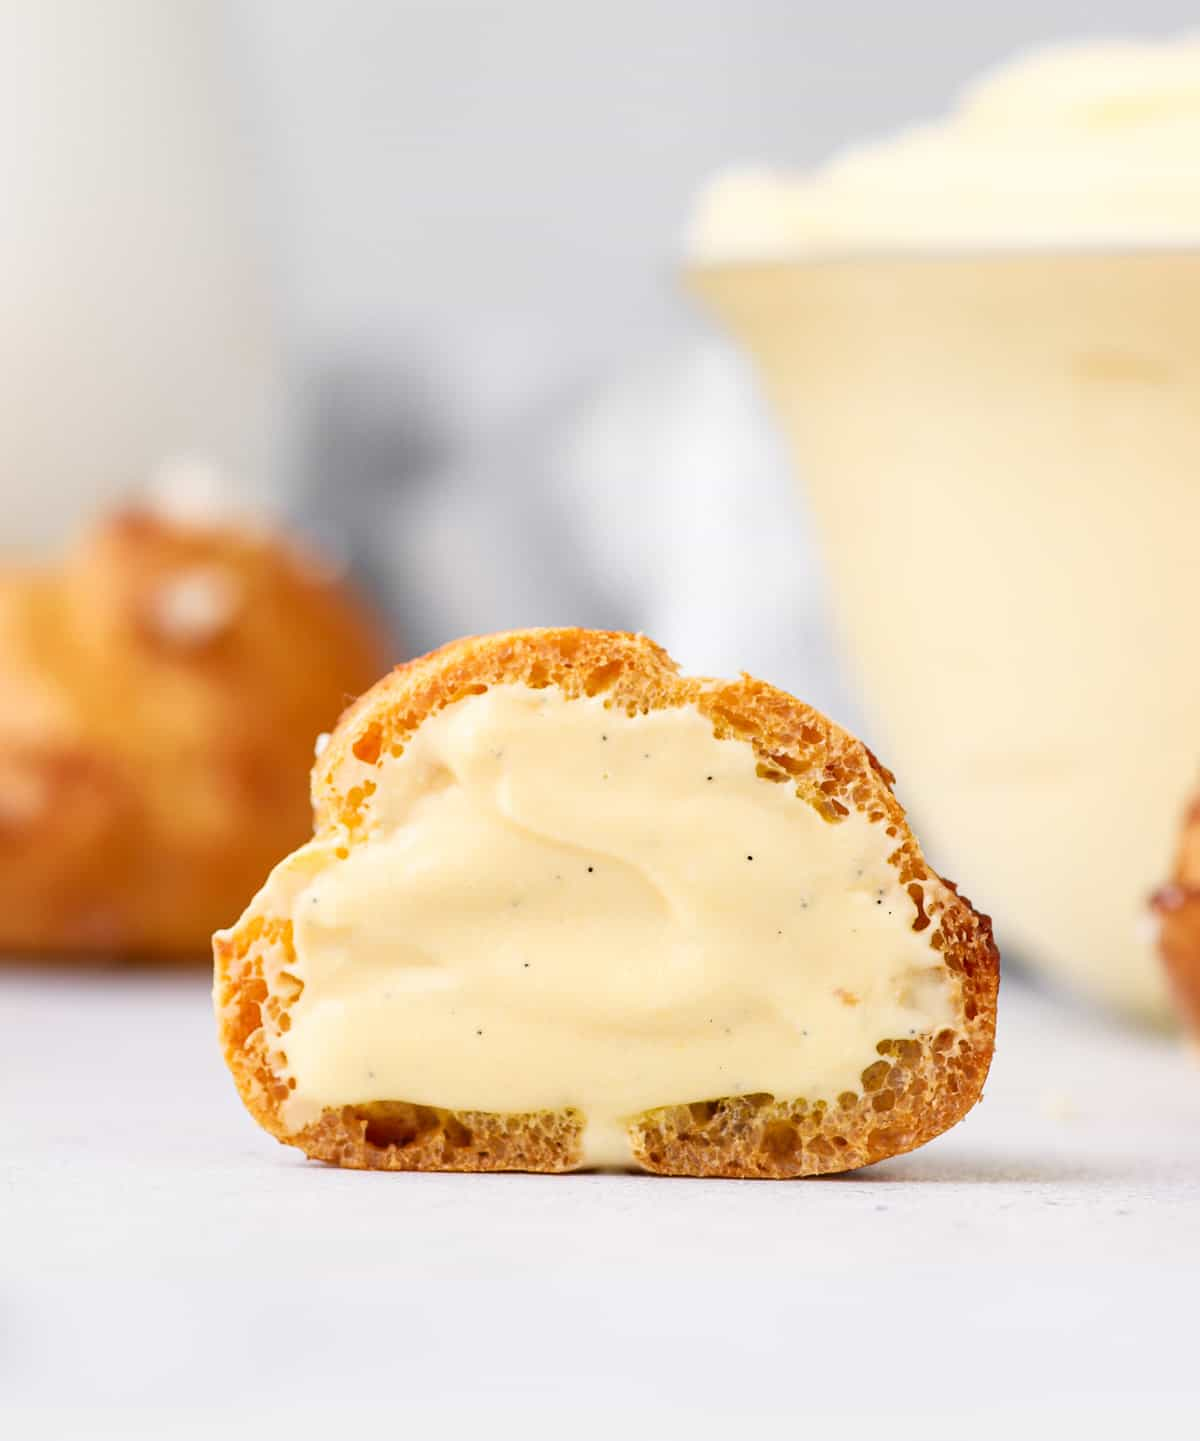 Choux bun cut in half filled with cream.